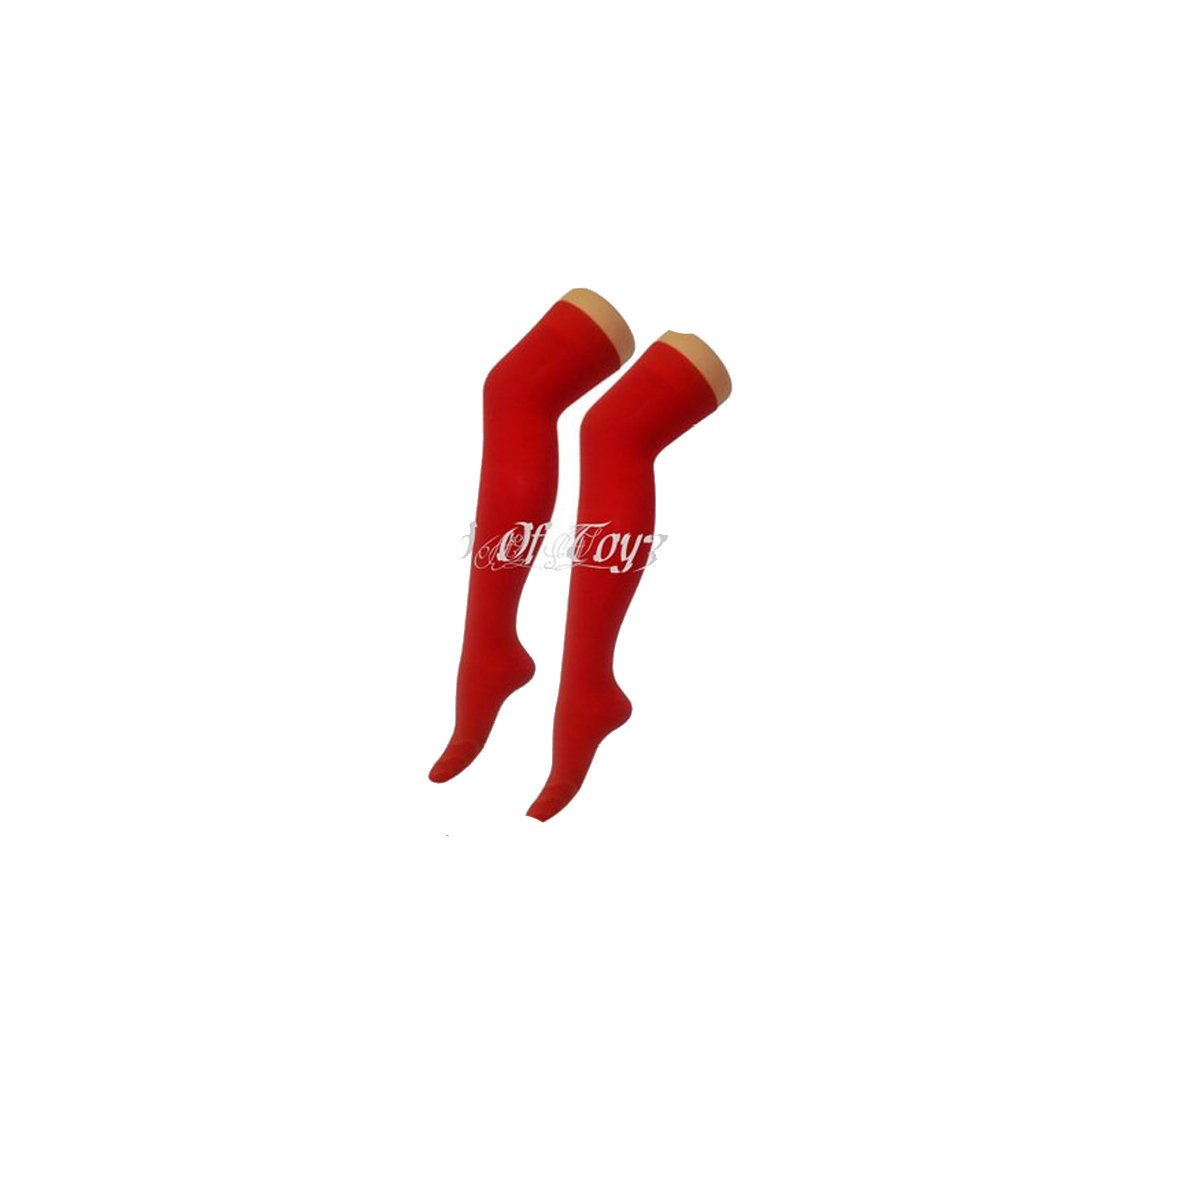 Girls Teens Ladies Neon Plain Socks In 8 Vibrant Colours Over The Knee Socks / Knee High 5Q-4F87-2Y6J